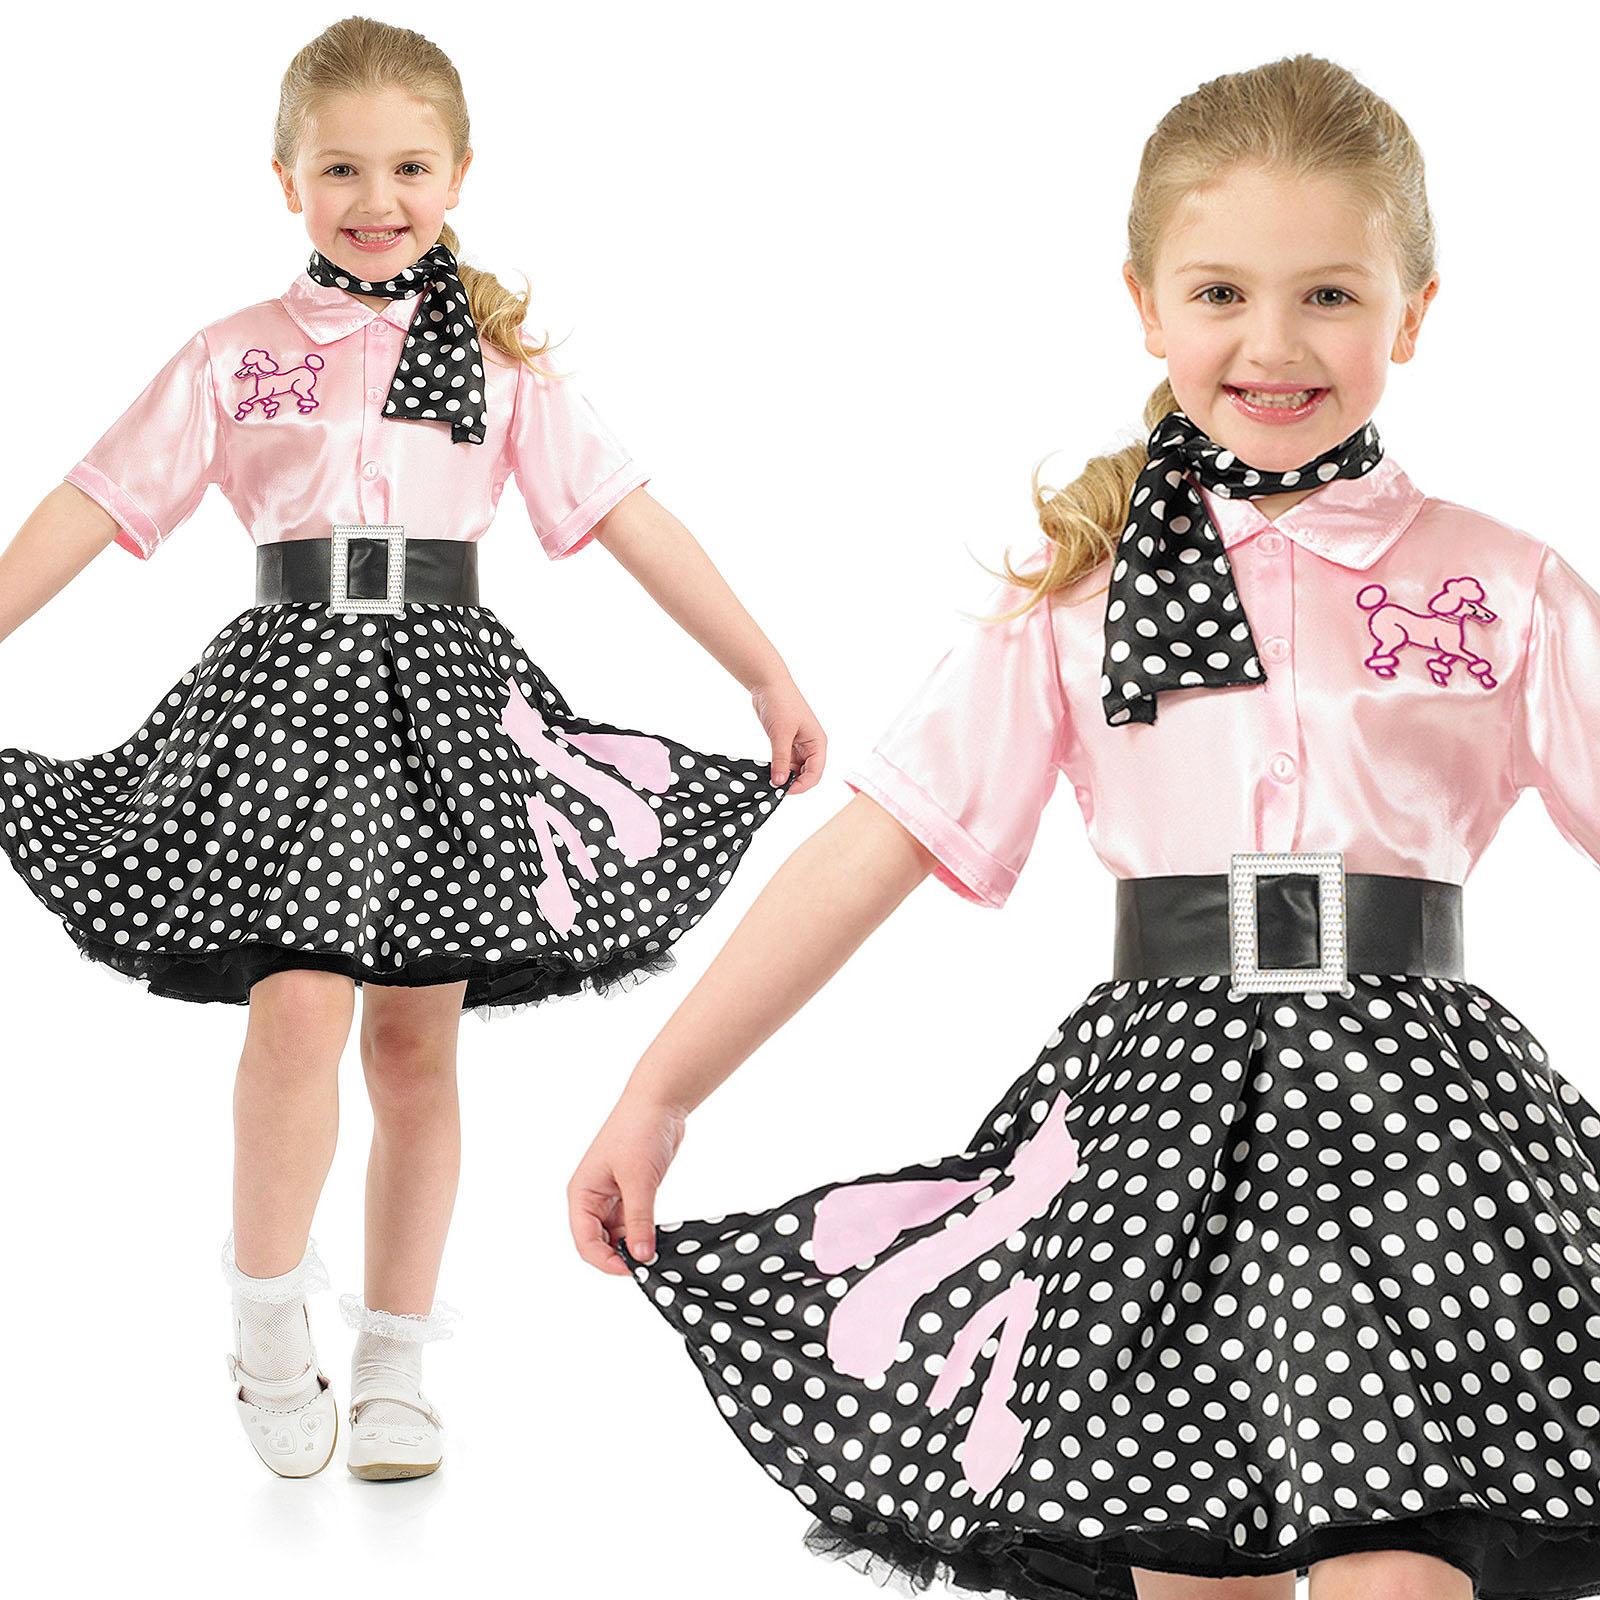 childrens pink polka dot rock n roll fancy dress costume 50s outfit 4 12 yrs ebay. Black Bedroom Furniture Sets. Home Design Ideas